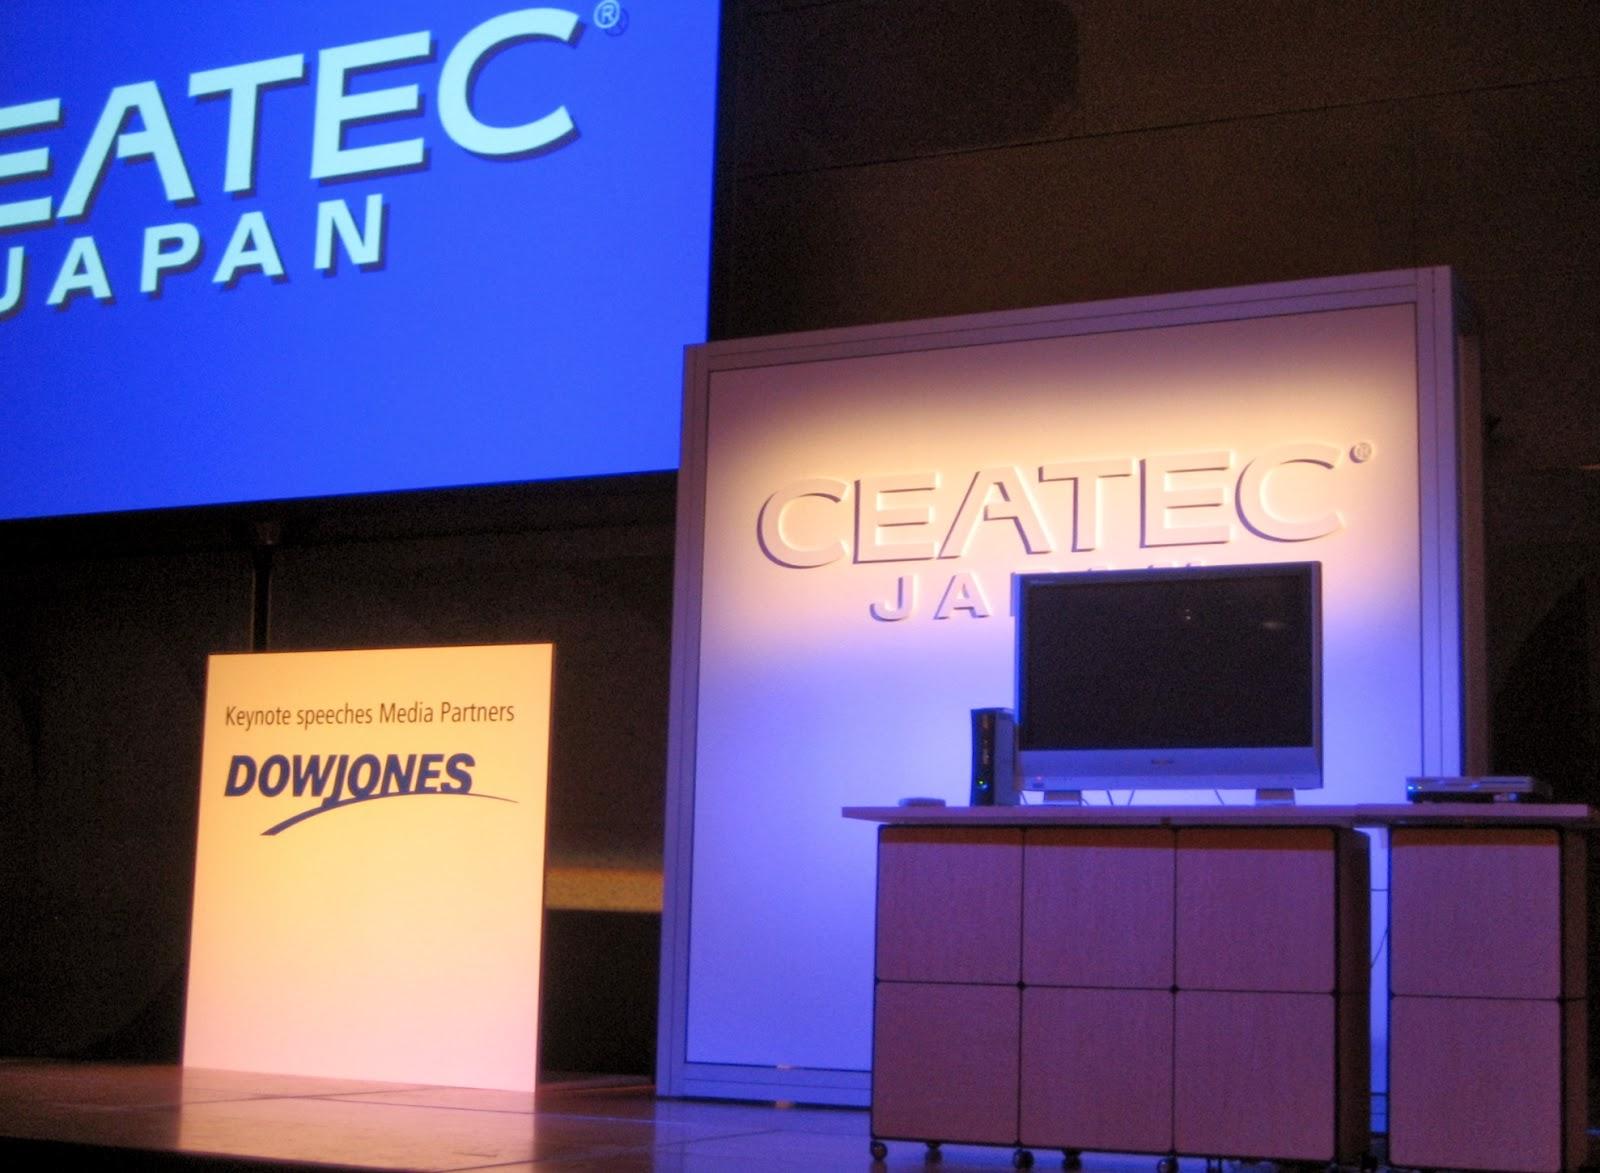 ceatec-japan-2007 シーテックジャパン2007年